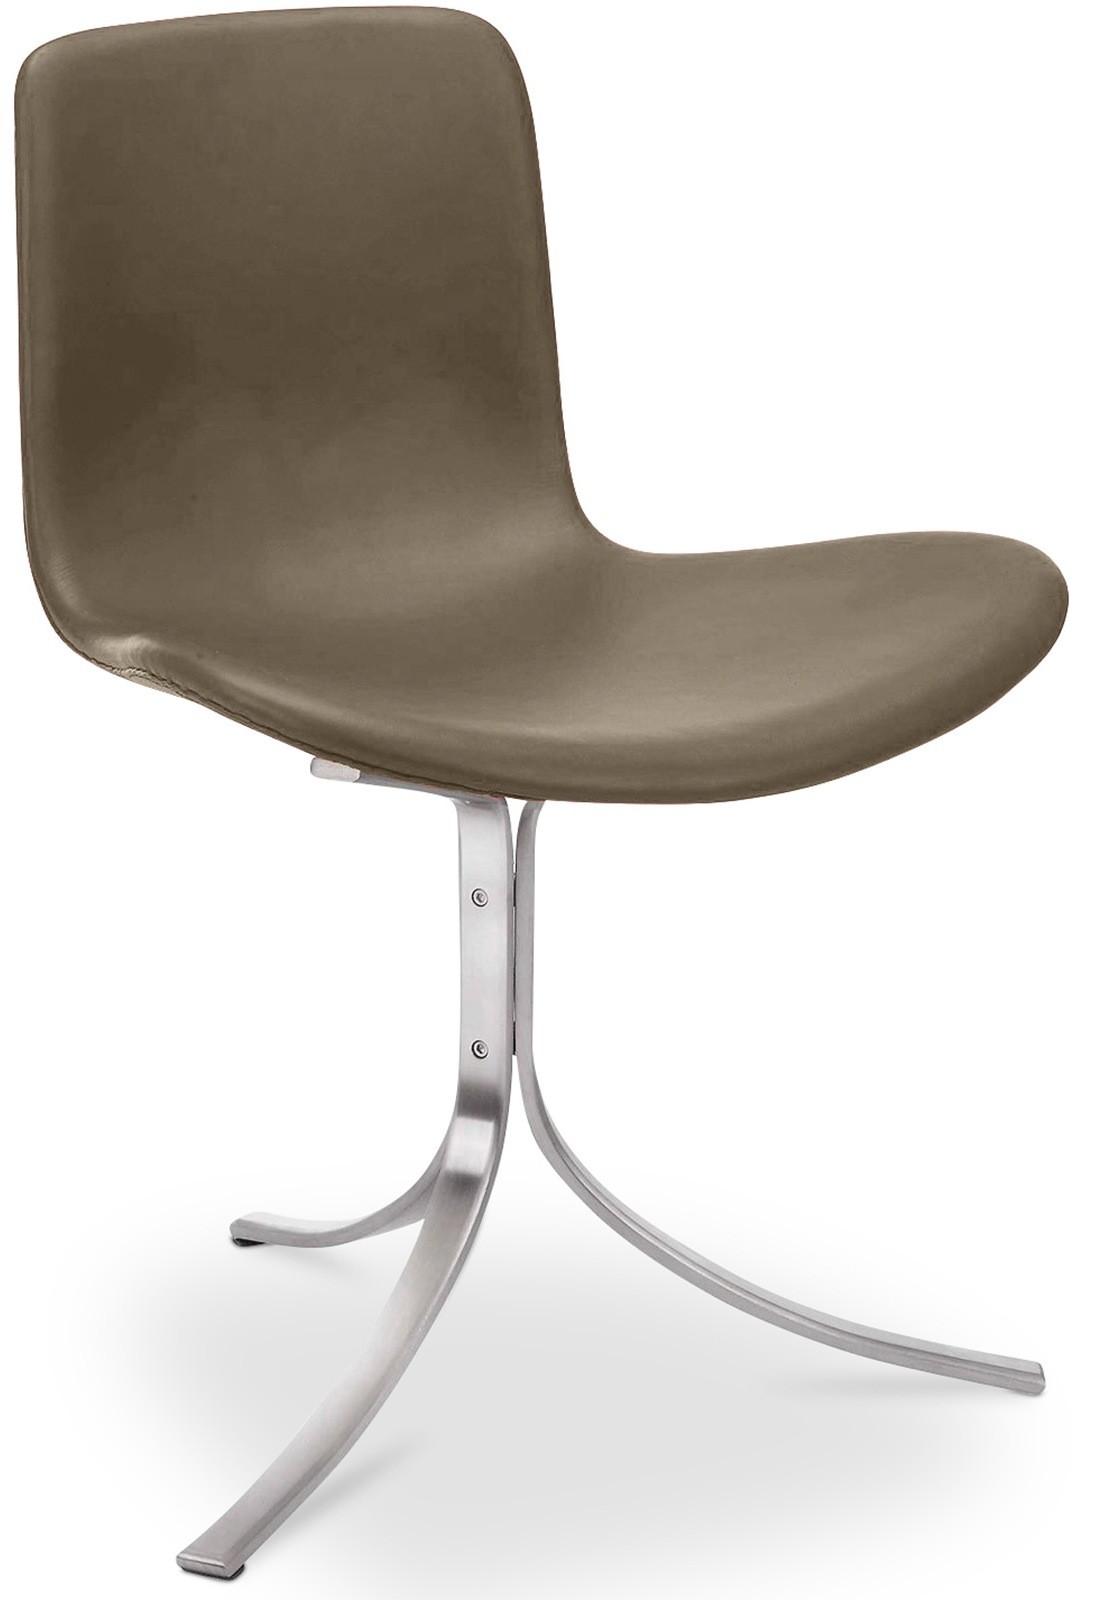 chaise acier et cuir taupe inspir py9. Black Bedroom Furniture Sets. Home Design Ideas